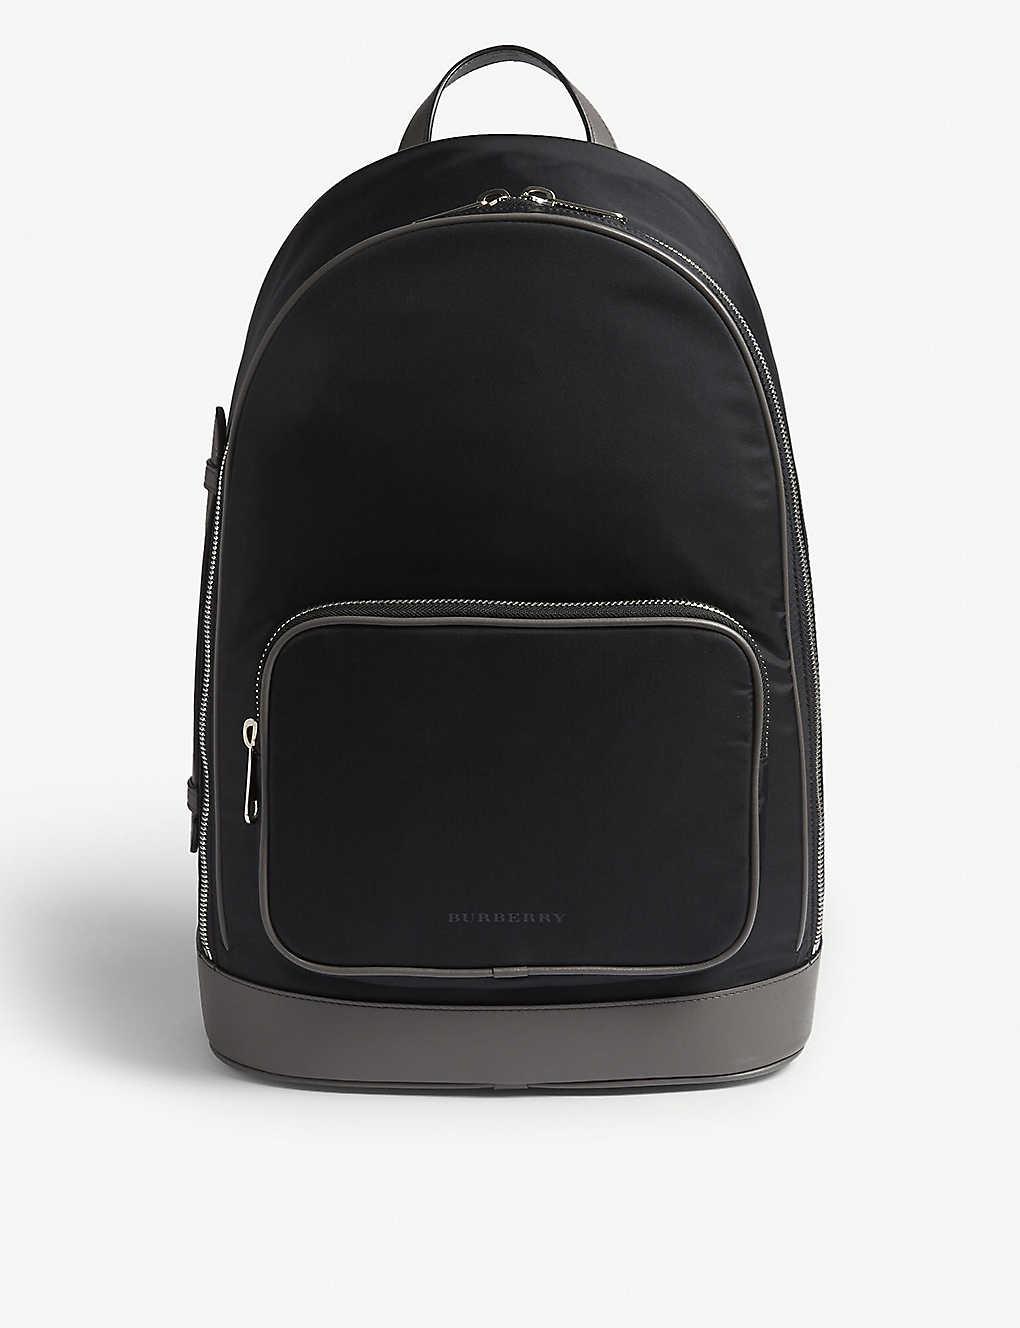 0b7adcac886 BURBERRY - Rocco nylon backpack   Selfridges.com